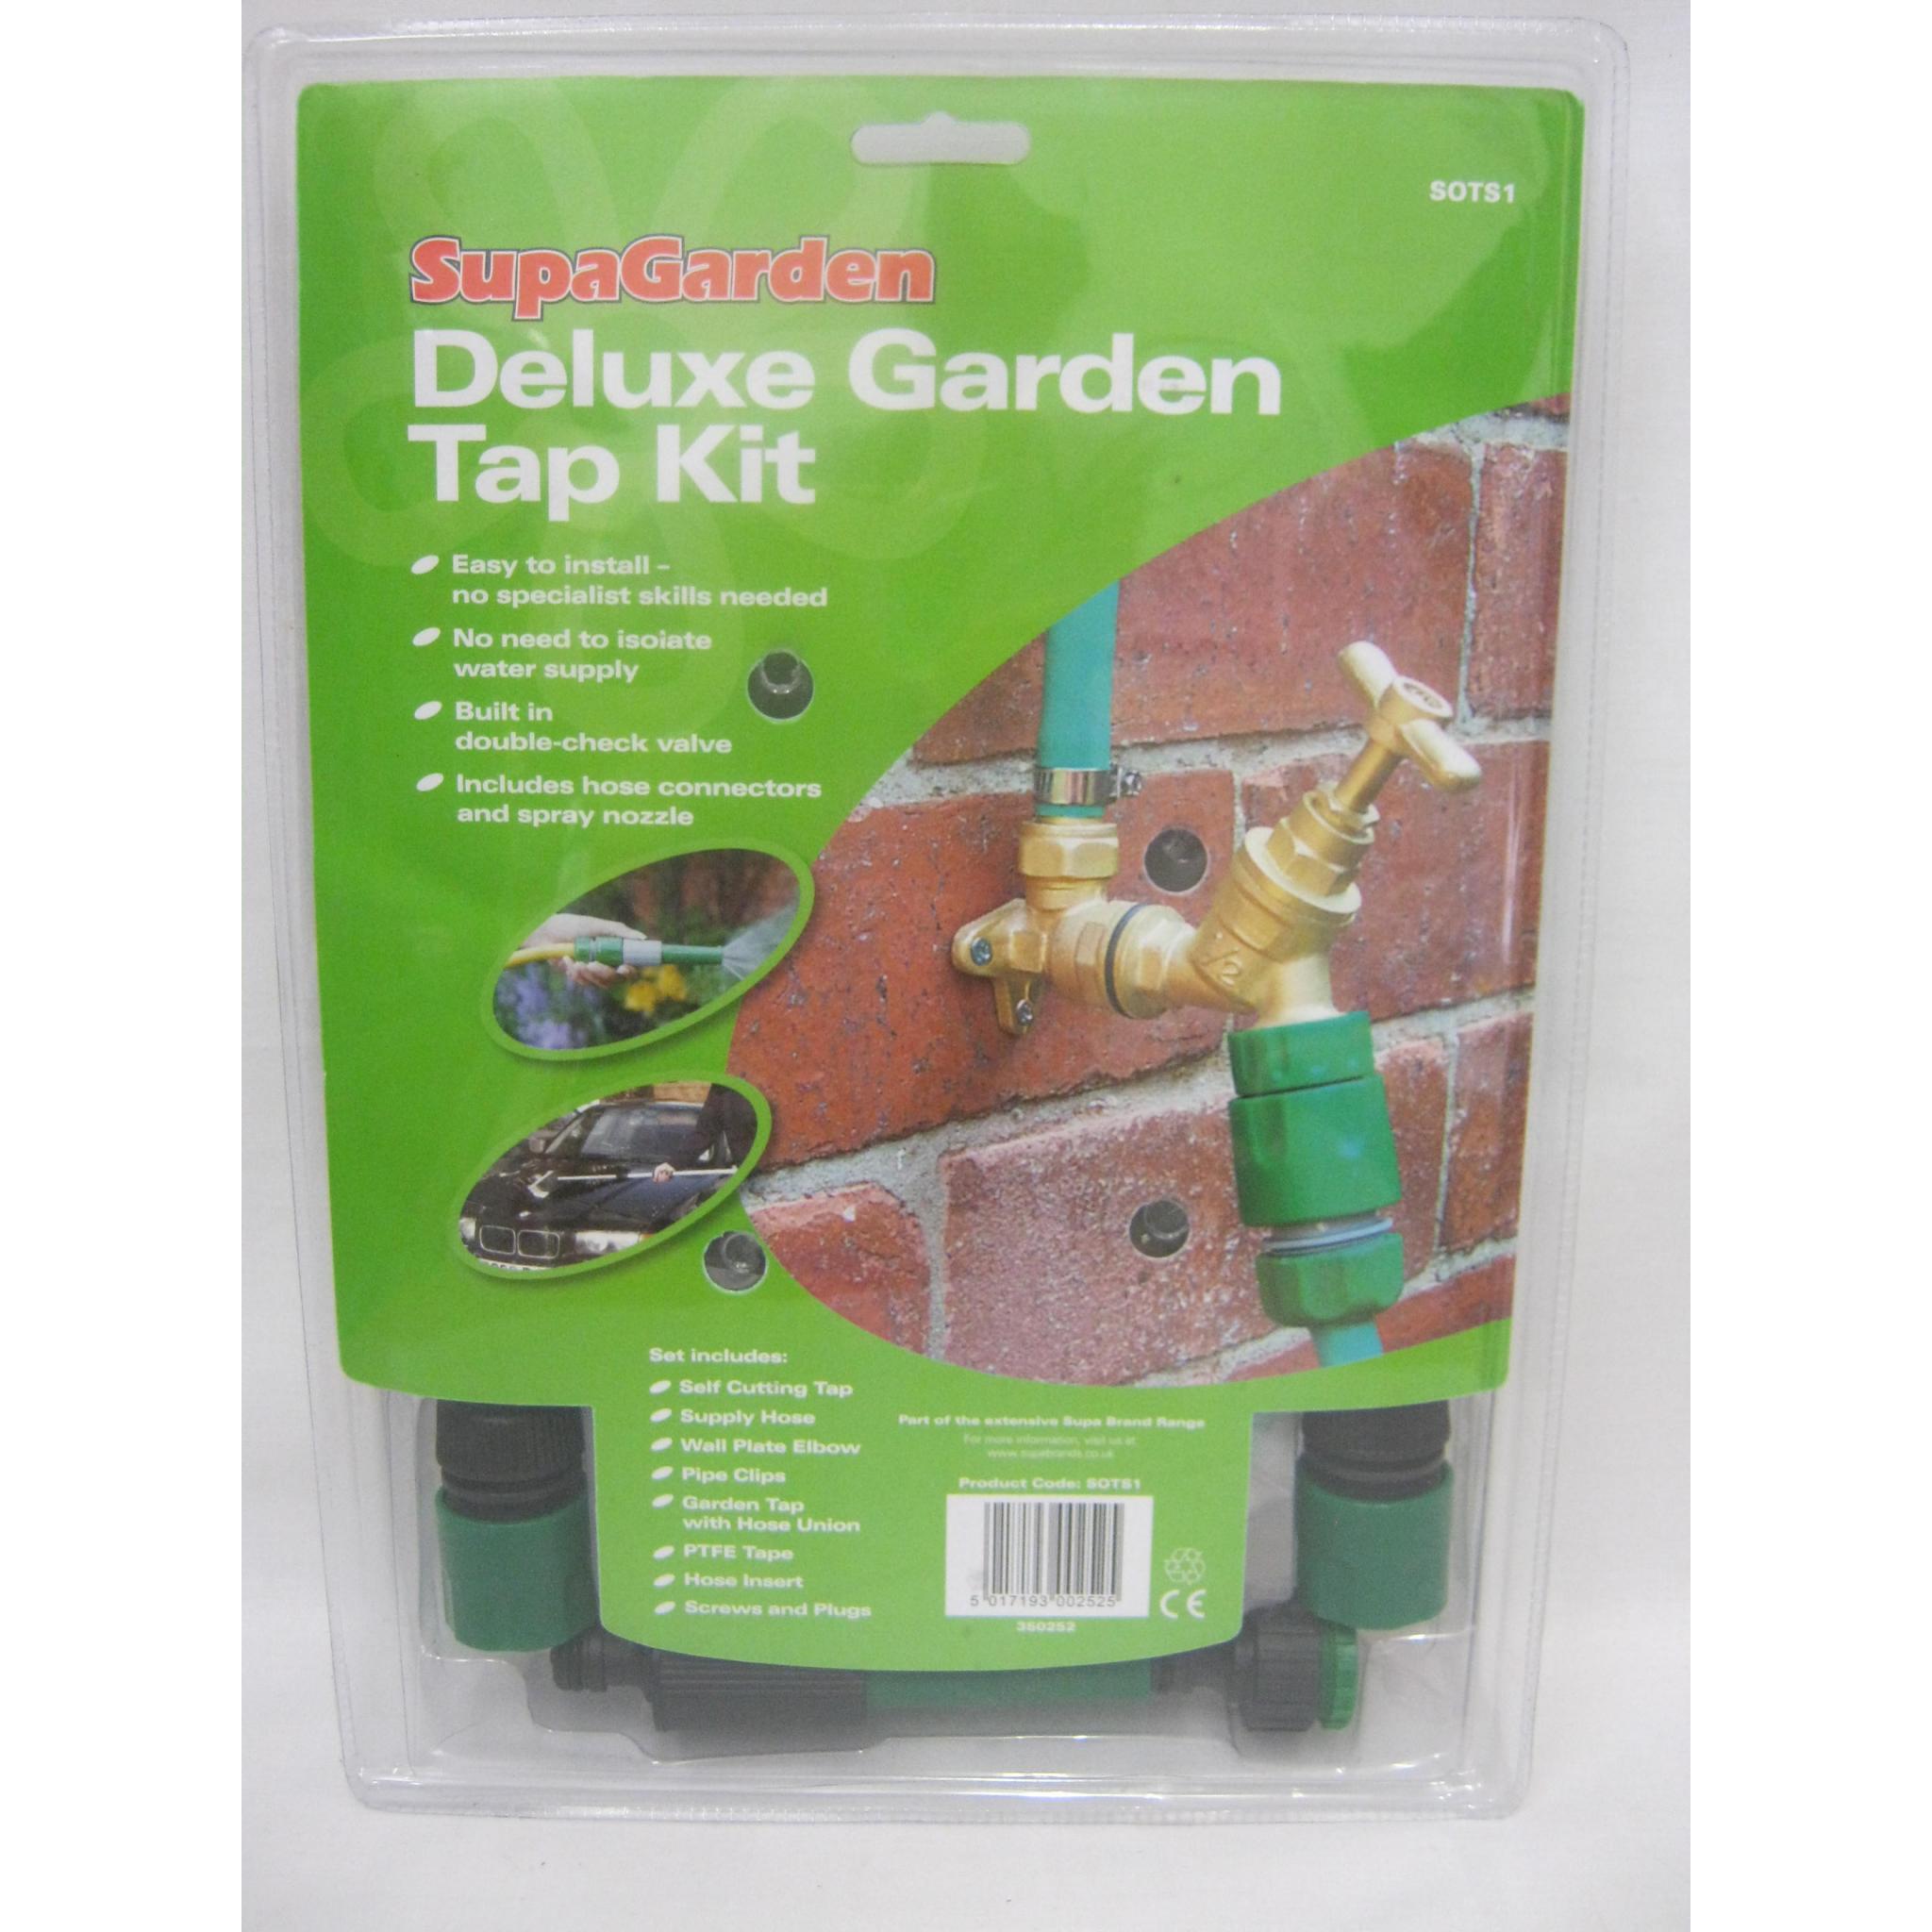 New Supagarden Deluxe Outdoor Outside Garden Tap Kit SOTS1